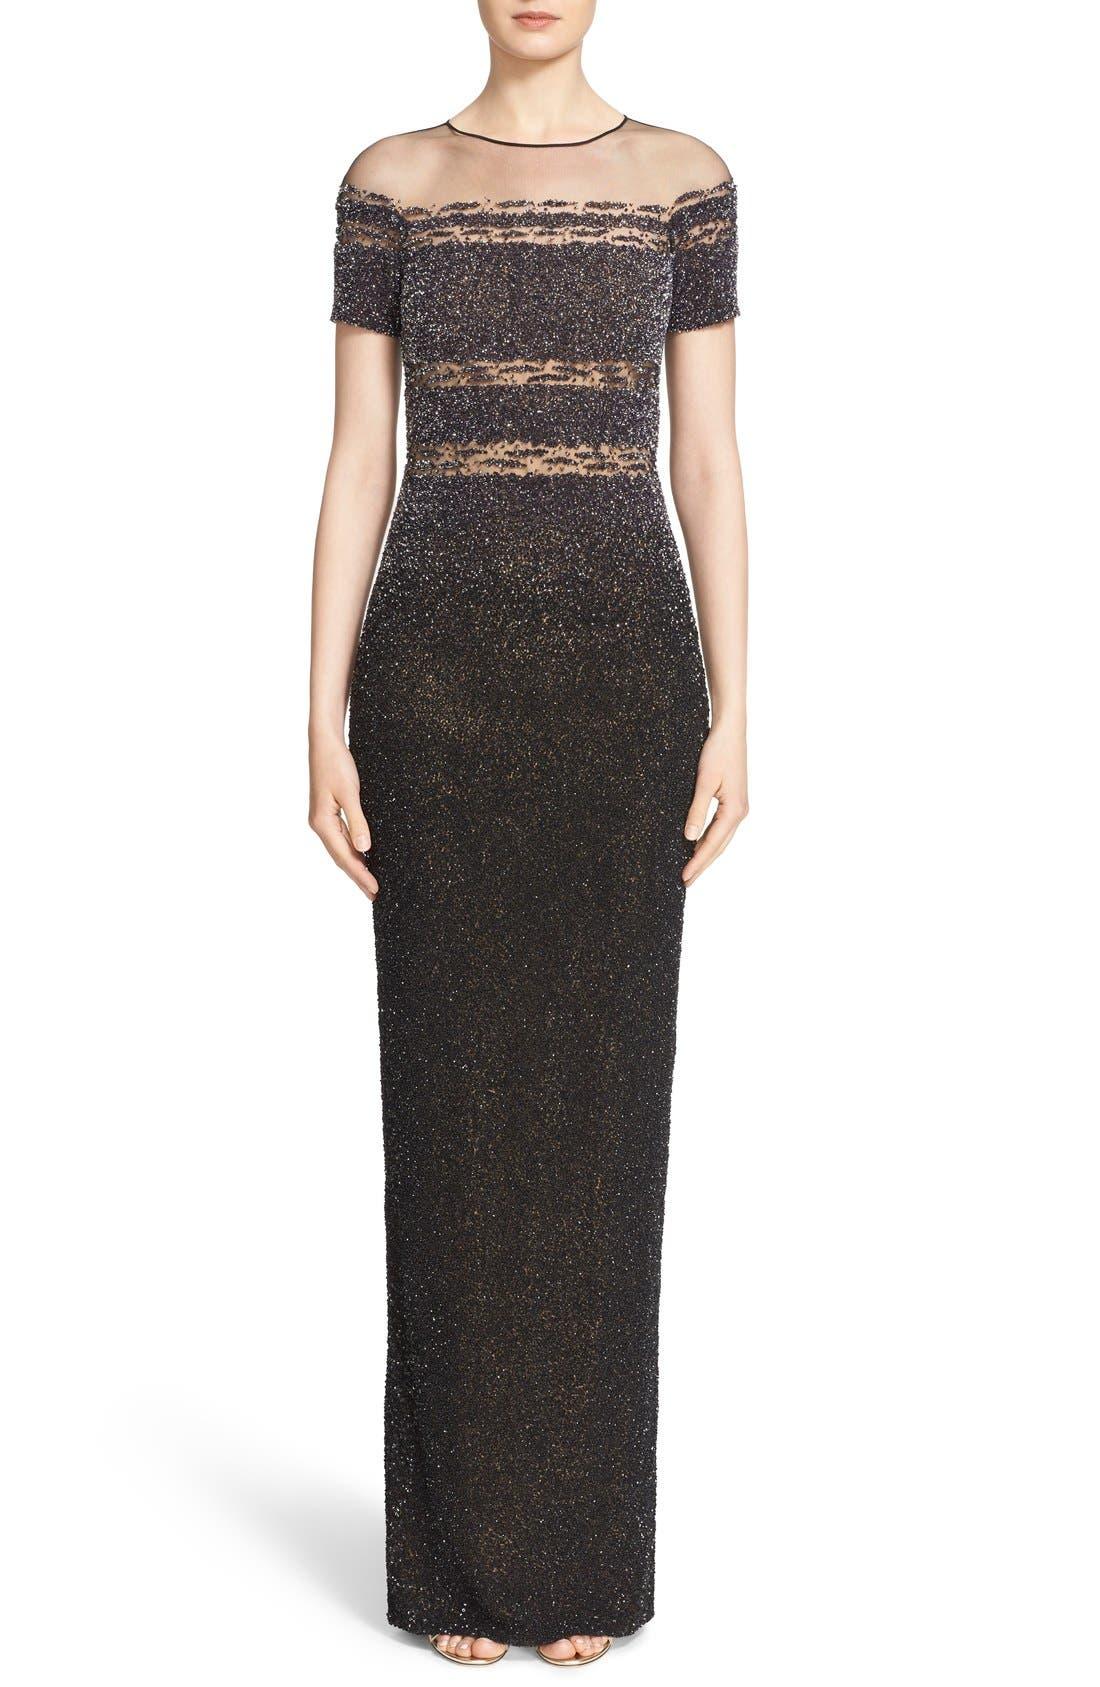 Alternate Image 1 Selected - Pamella Roland Illusion & Sequin Column Gown